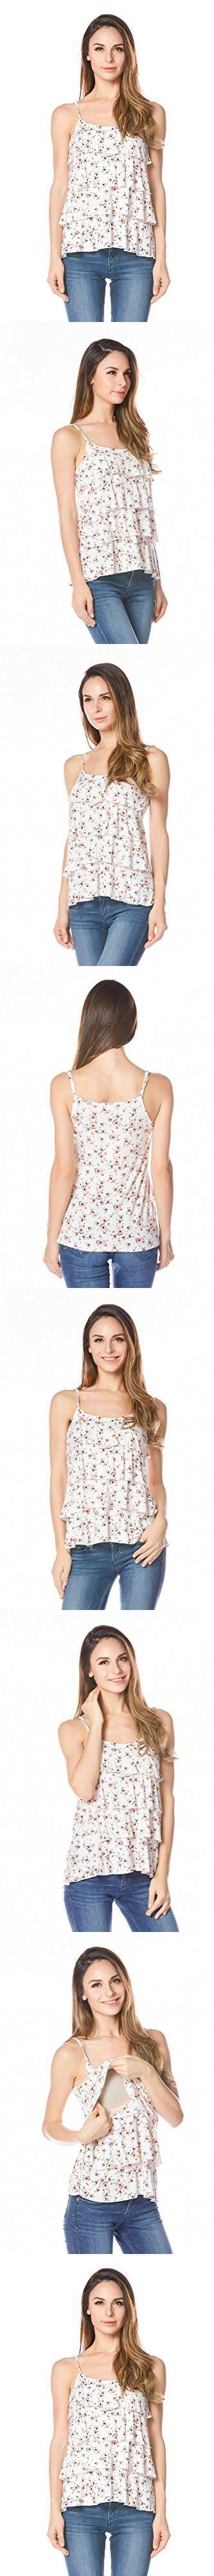 Bearsland Women's Maternity Nursing Tank Top and Cami Shirts,Pink/White,Medium